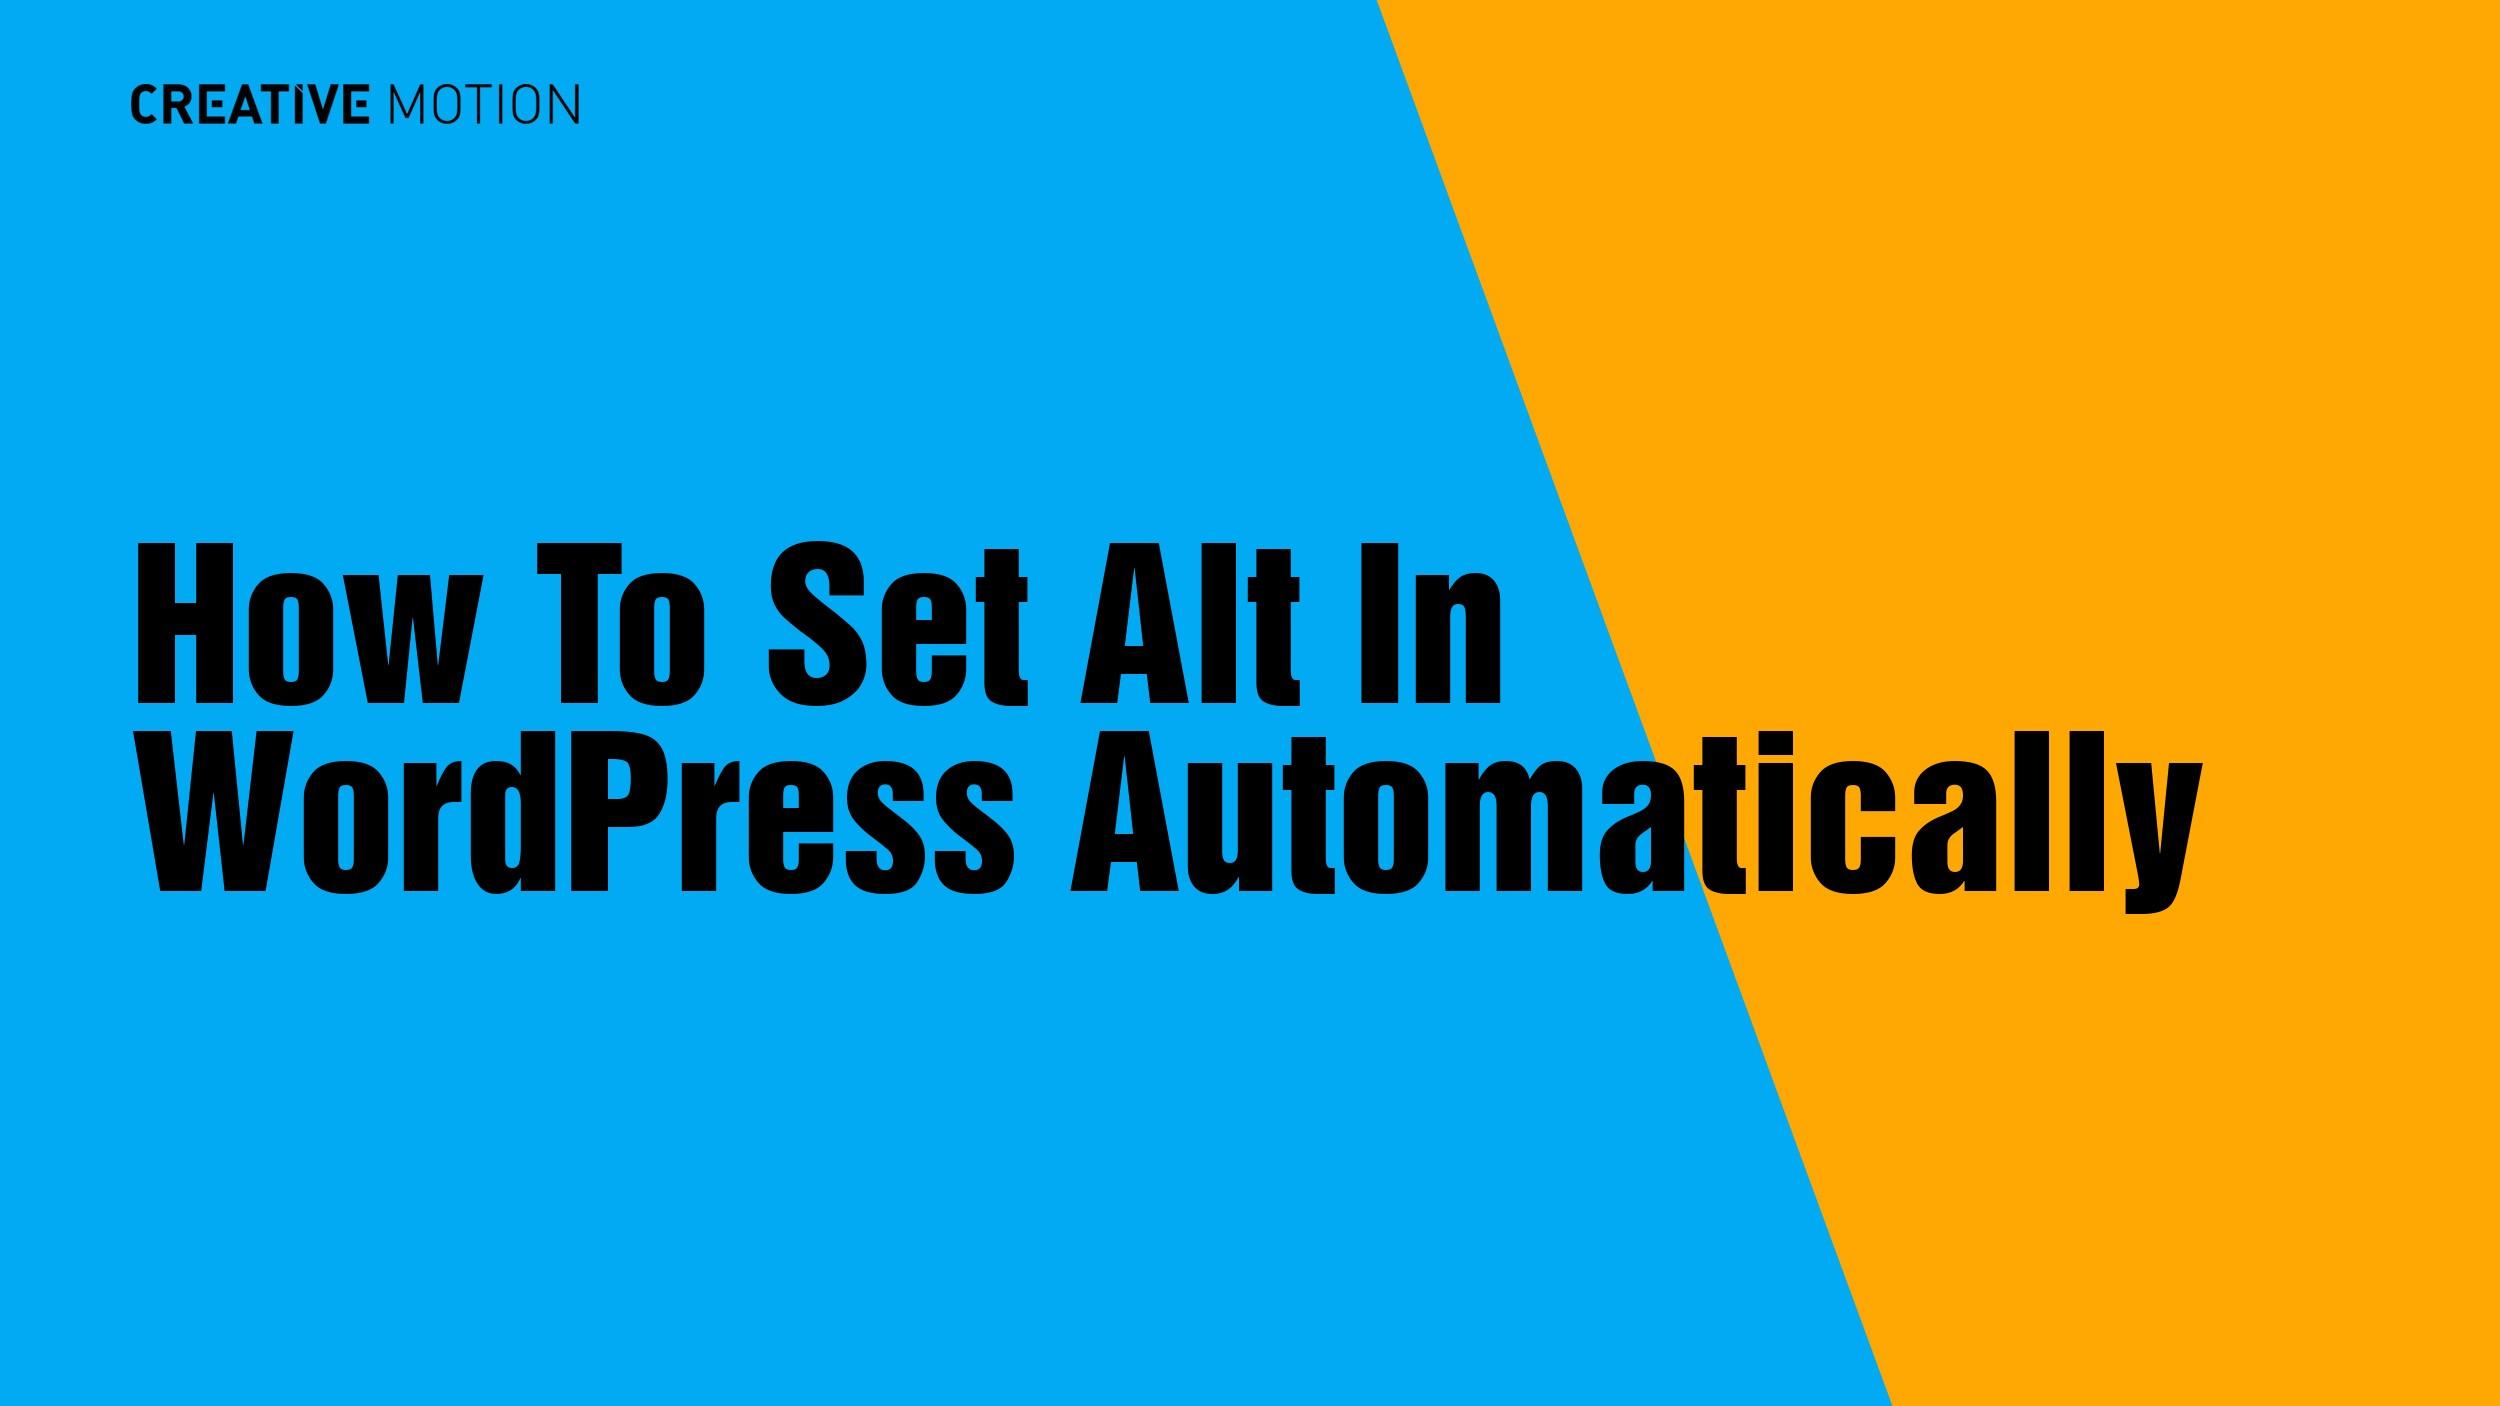 How To Set Alt In WordPress Automatically